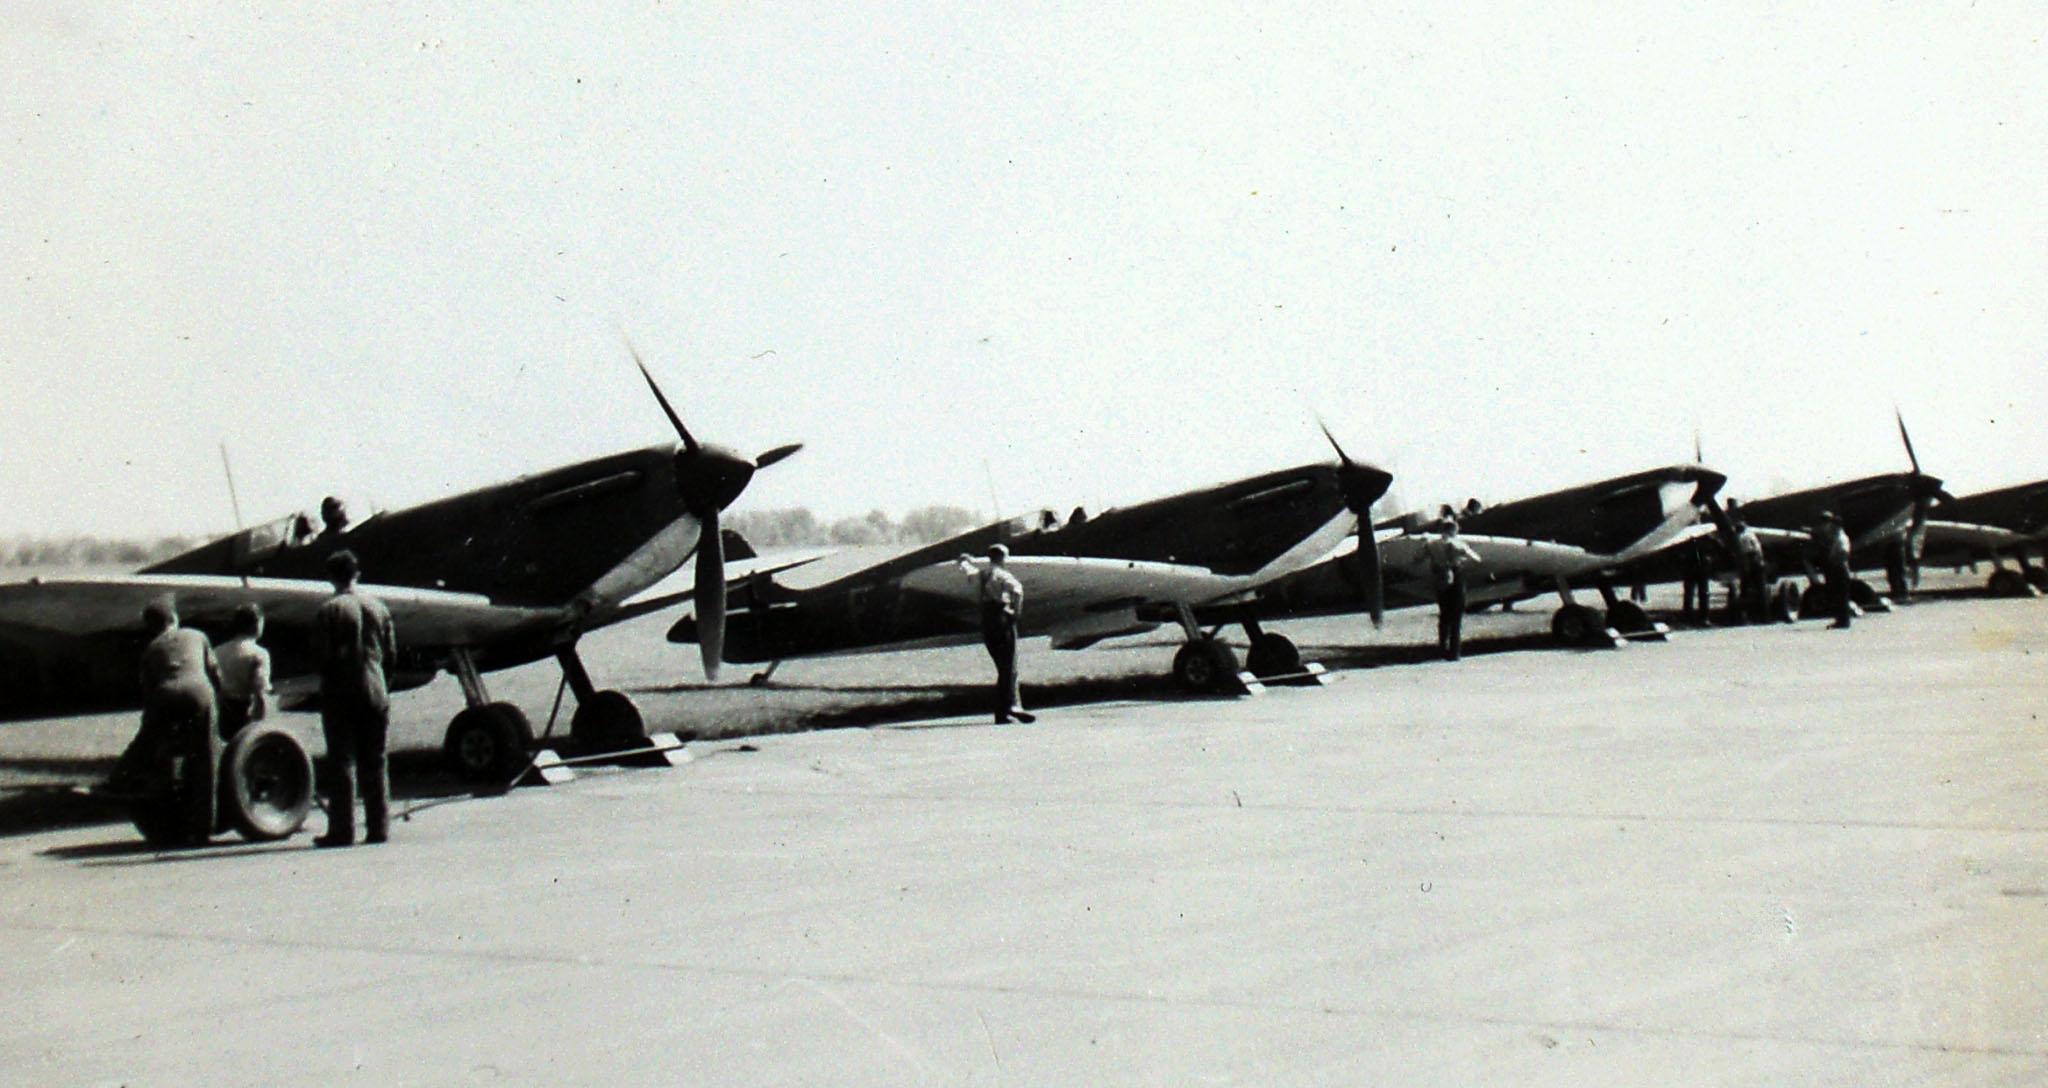 Spitfire MkIa RAF 65Sqn FZ line up RAF Hornchurch photo taken by Patrick Hayes KIA July 7 1940 01